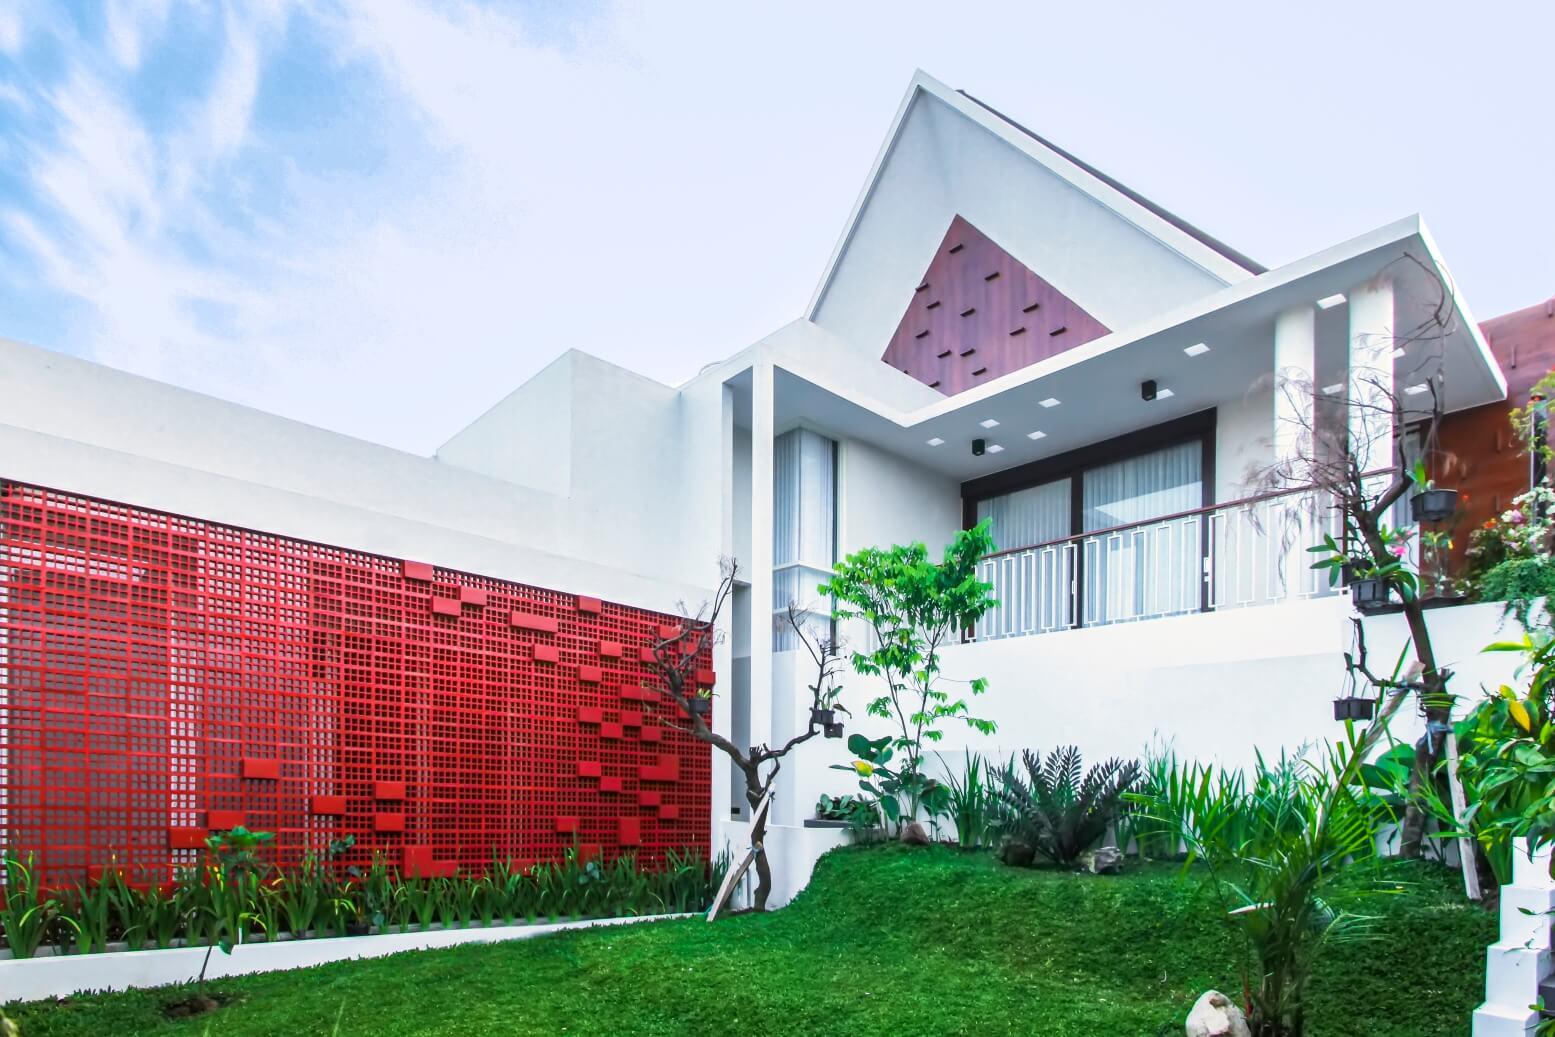 arsitek malang, jasa arsitek malang, satuvista architect, jasa arsitek, arsitek indonesia